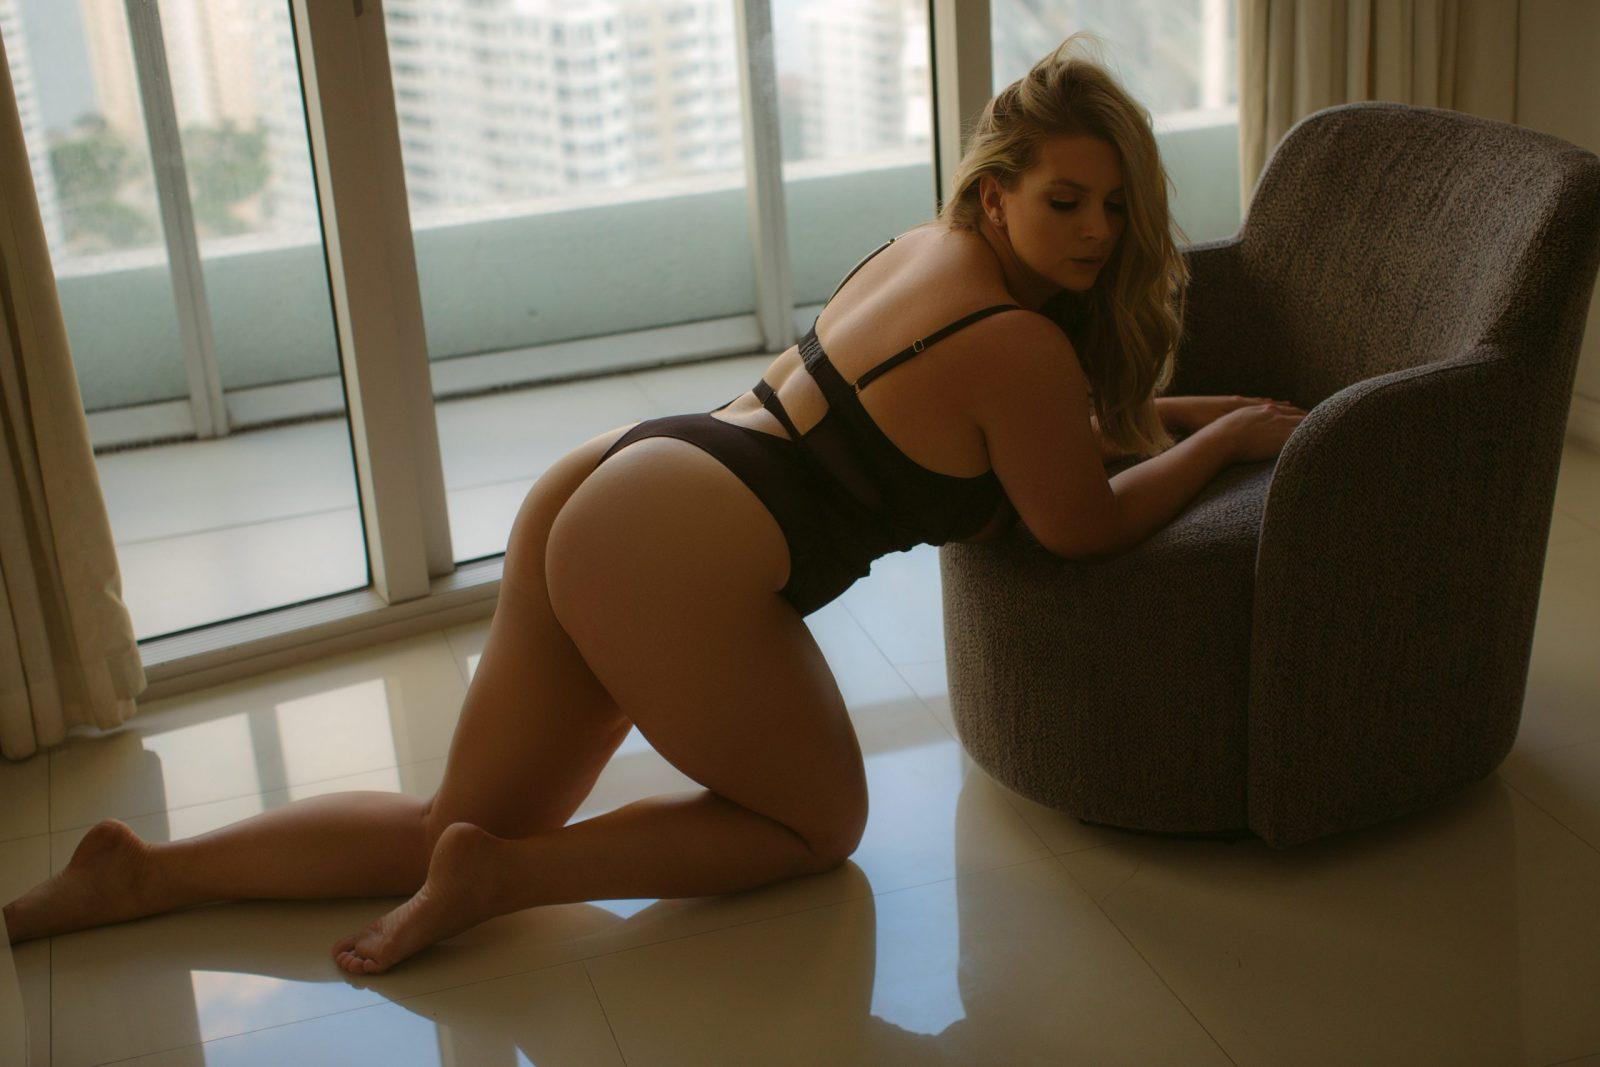 classy boudoir photo shoot ideas